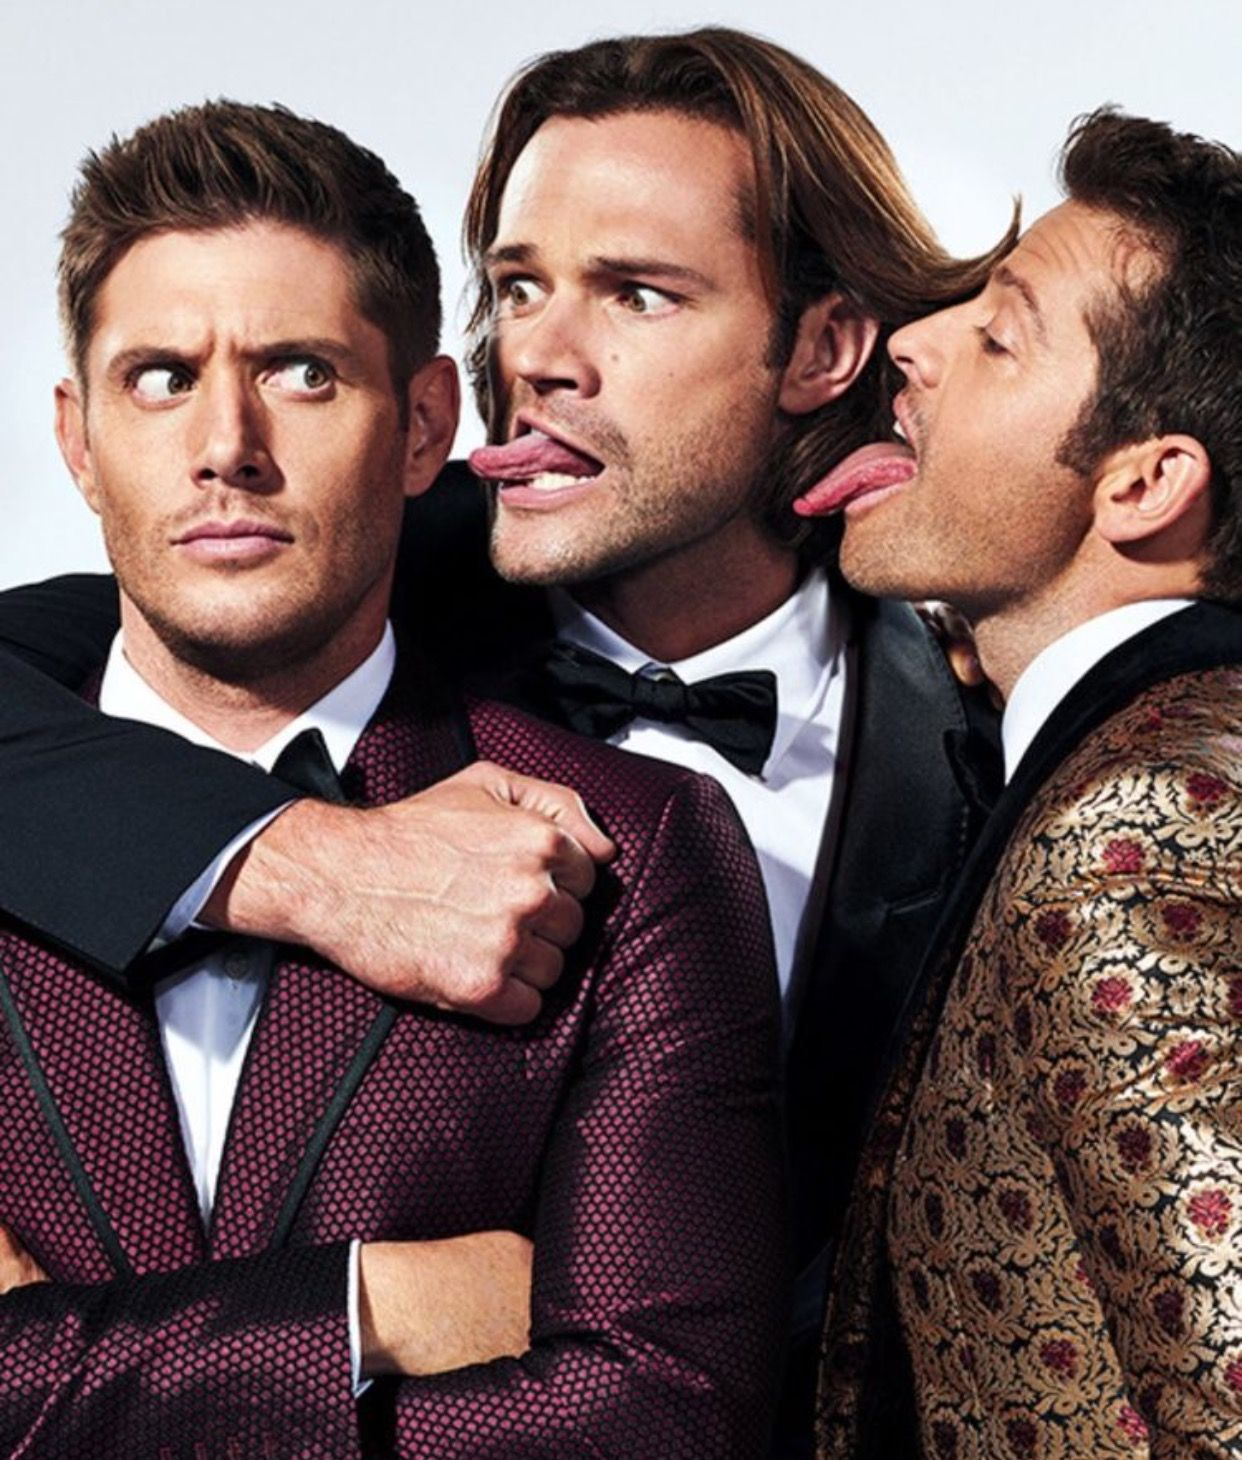 Jensen Jared And Misha Ew Photo Shoot Halloween Edition October